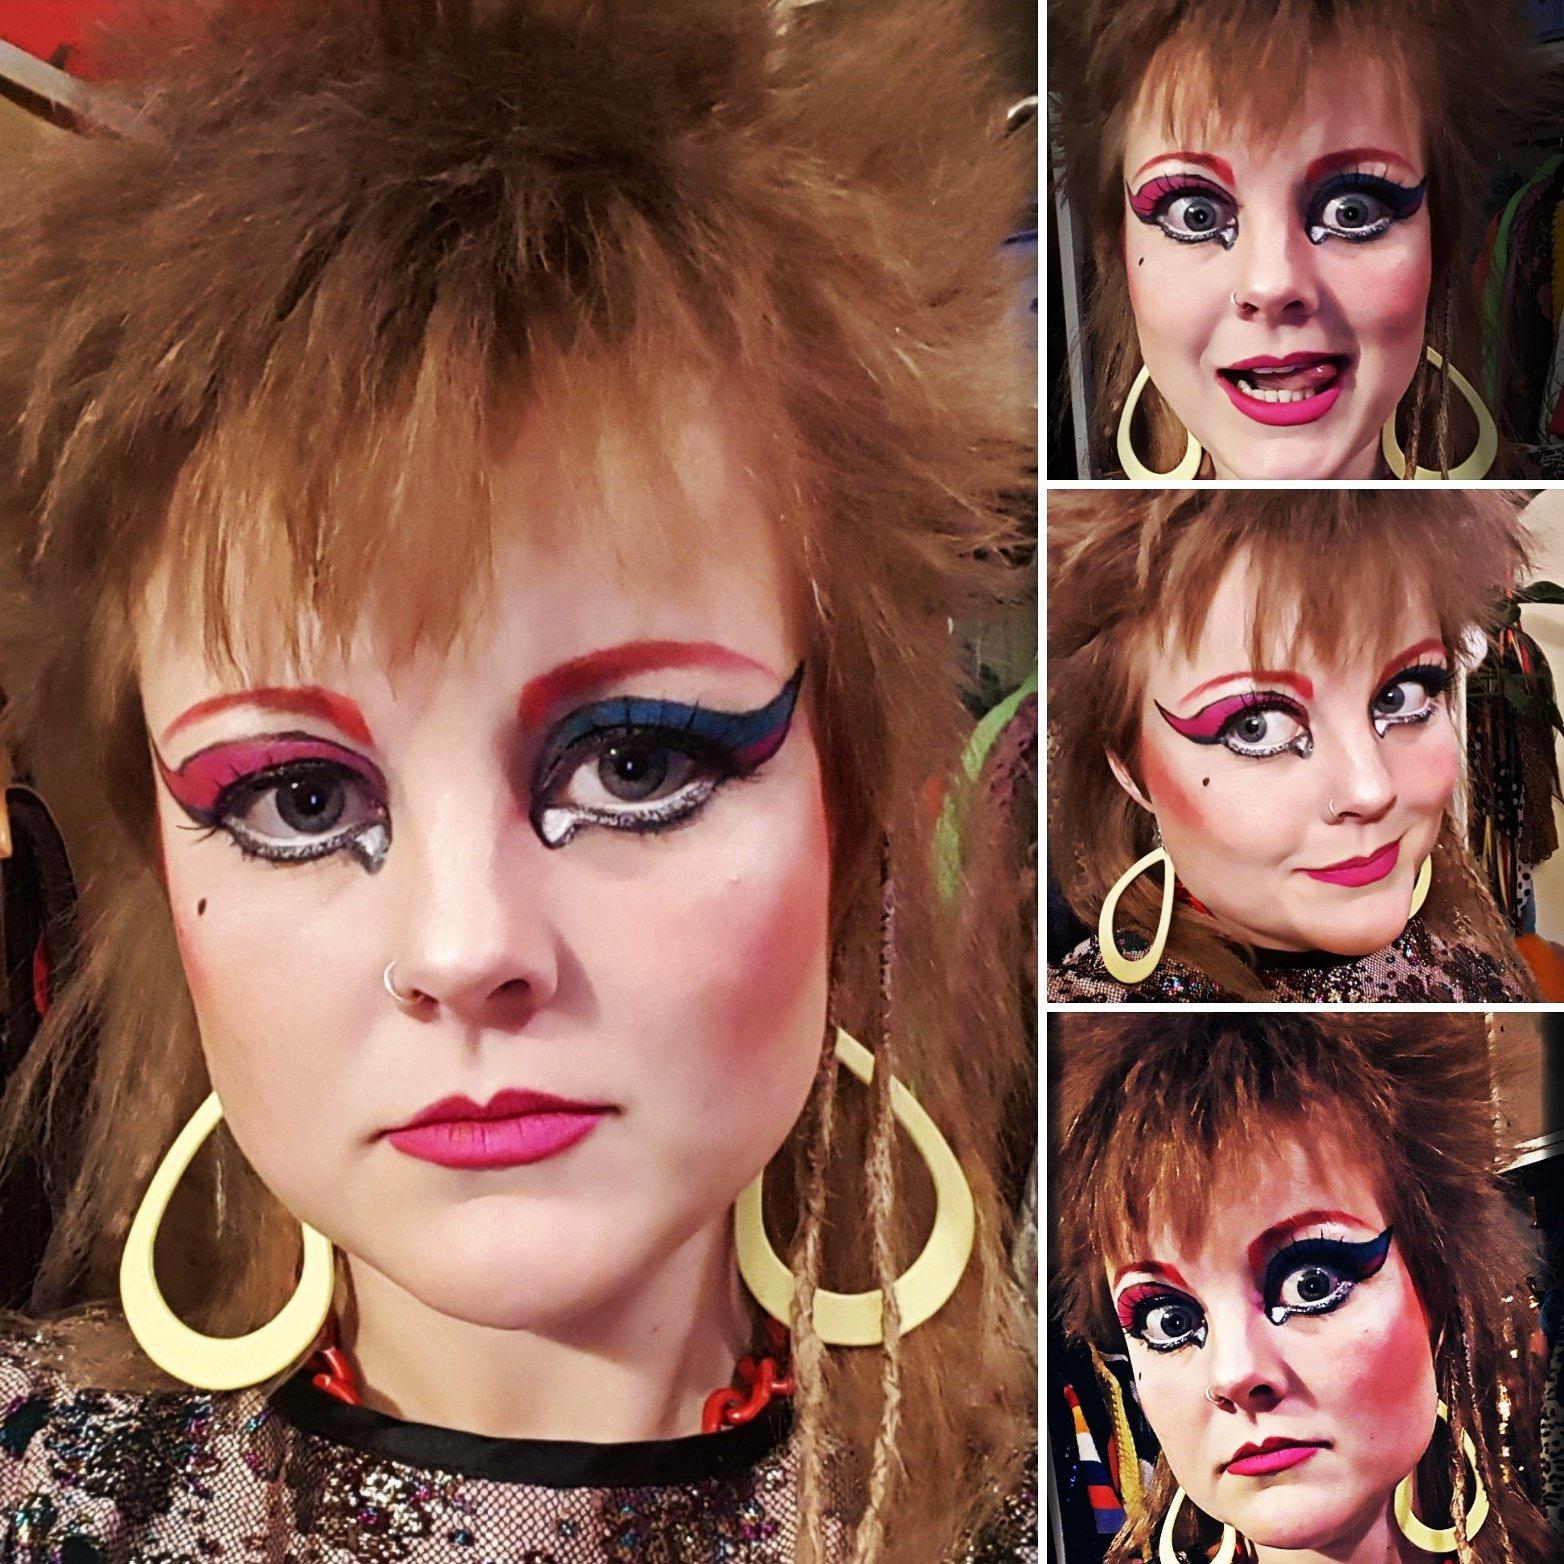 Eighties make-up